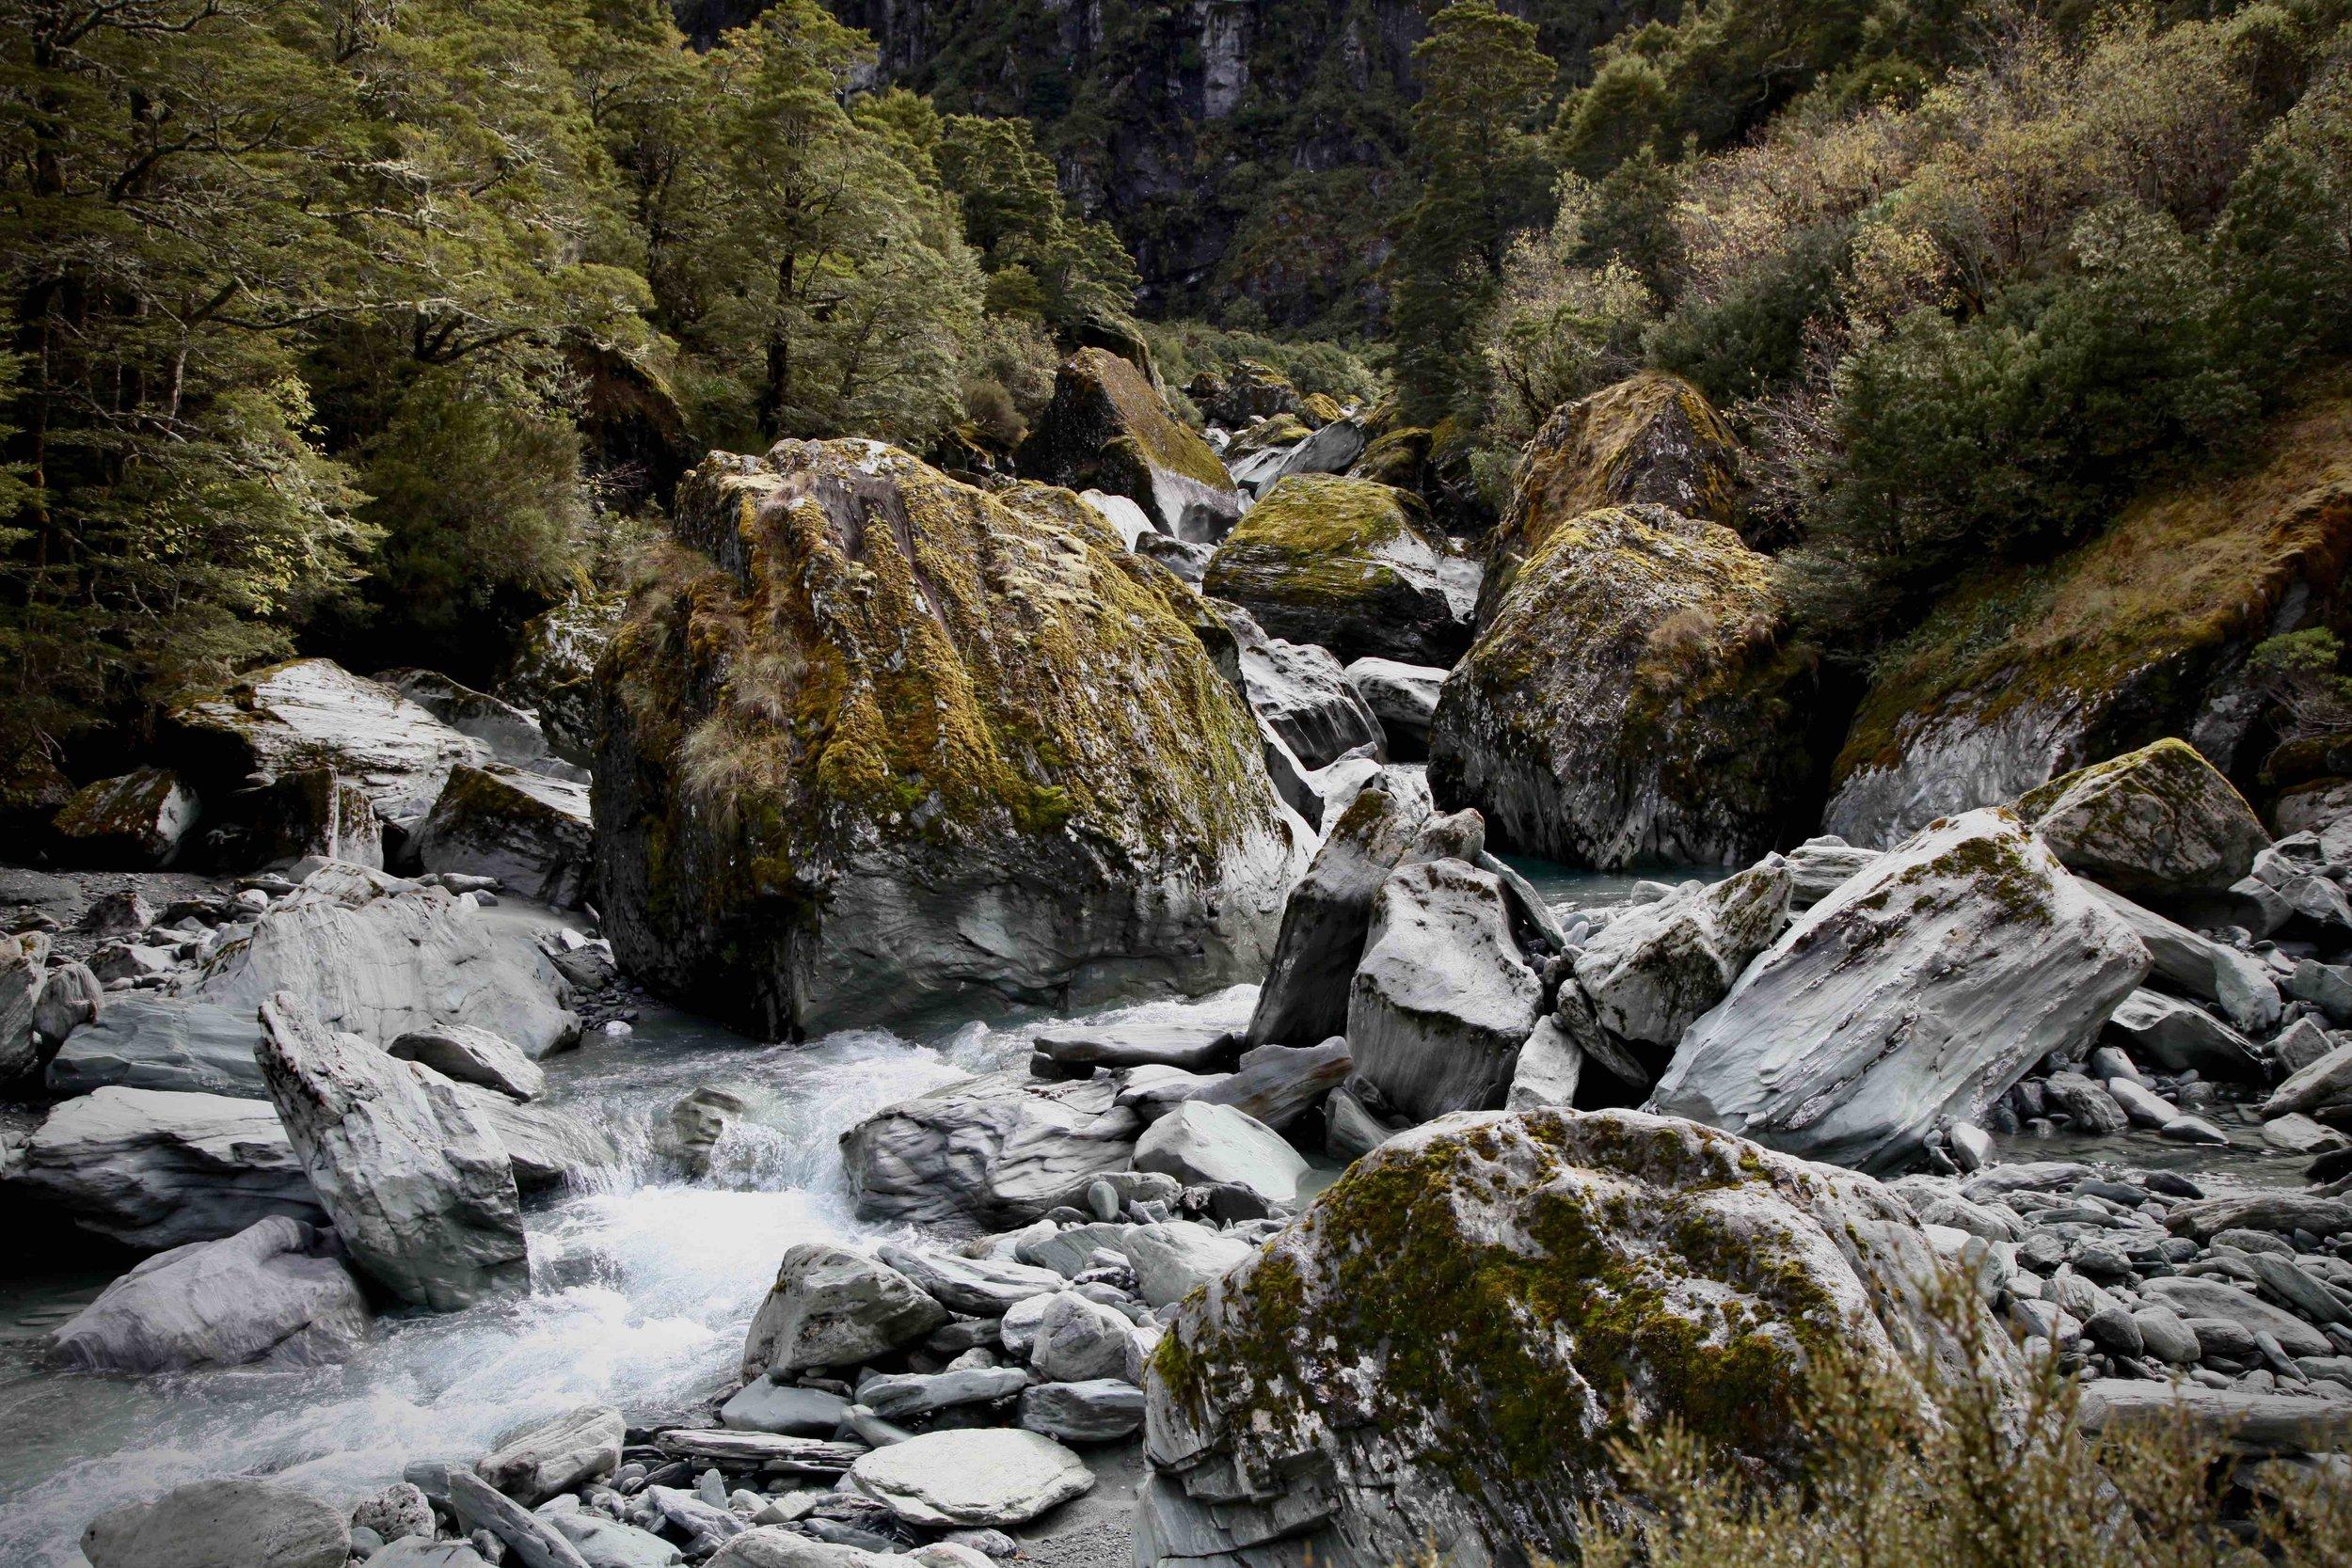 mossy-rocks-river-mt-aspiring-np.jpg